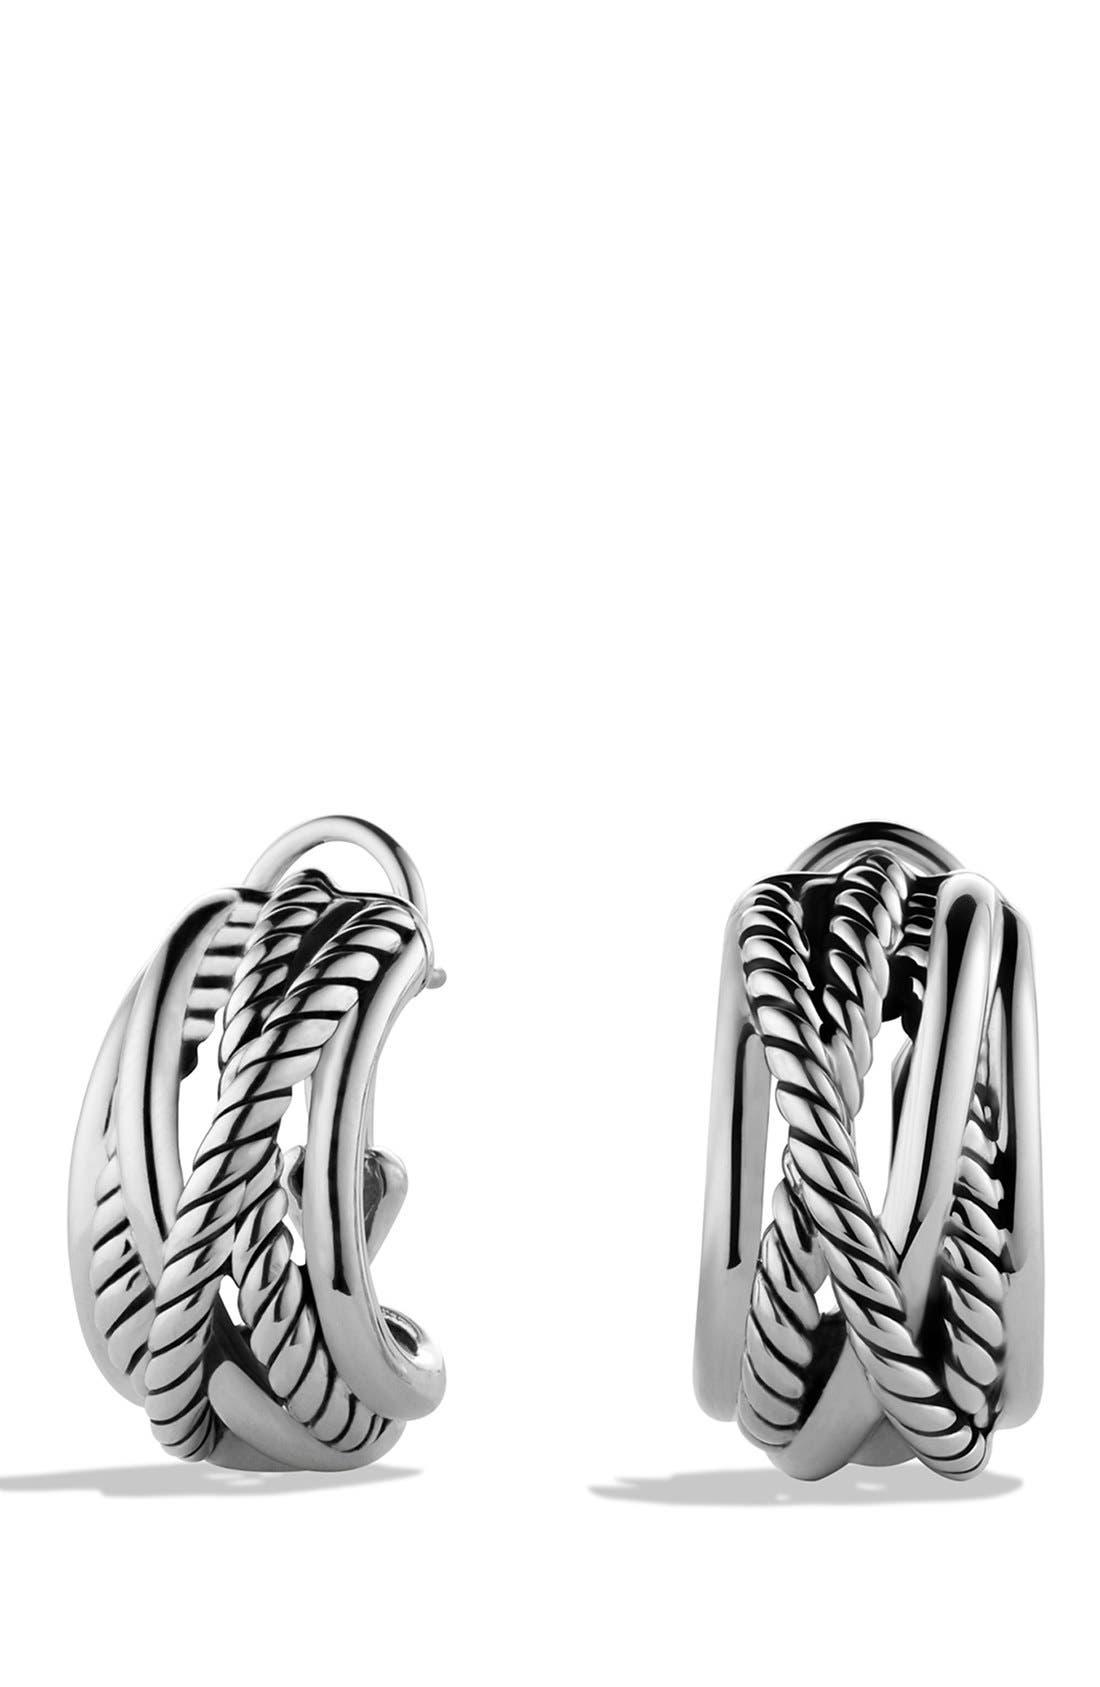 DAVID YURMAN 'Crossover' Earrings, Main, color, SILVER